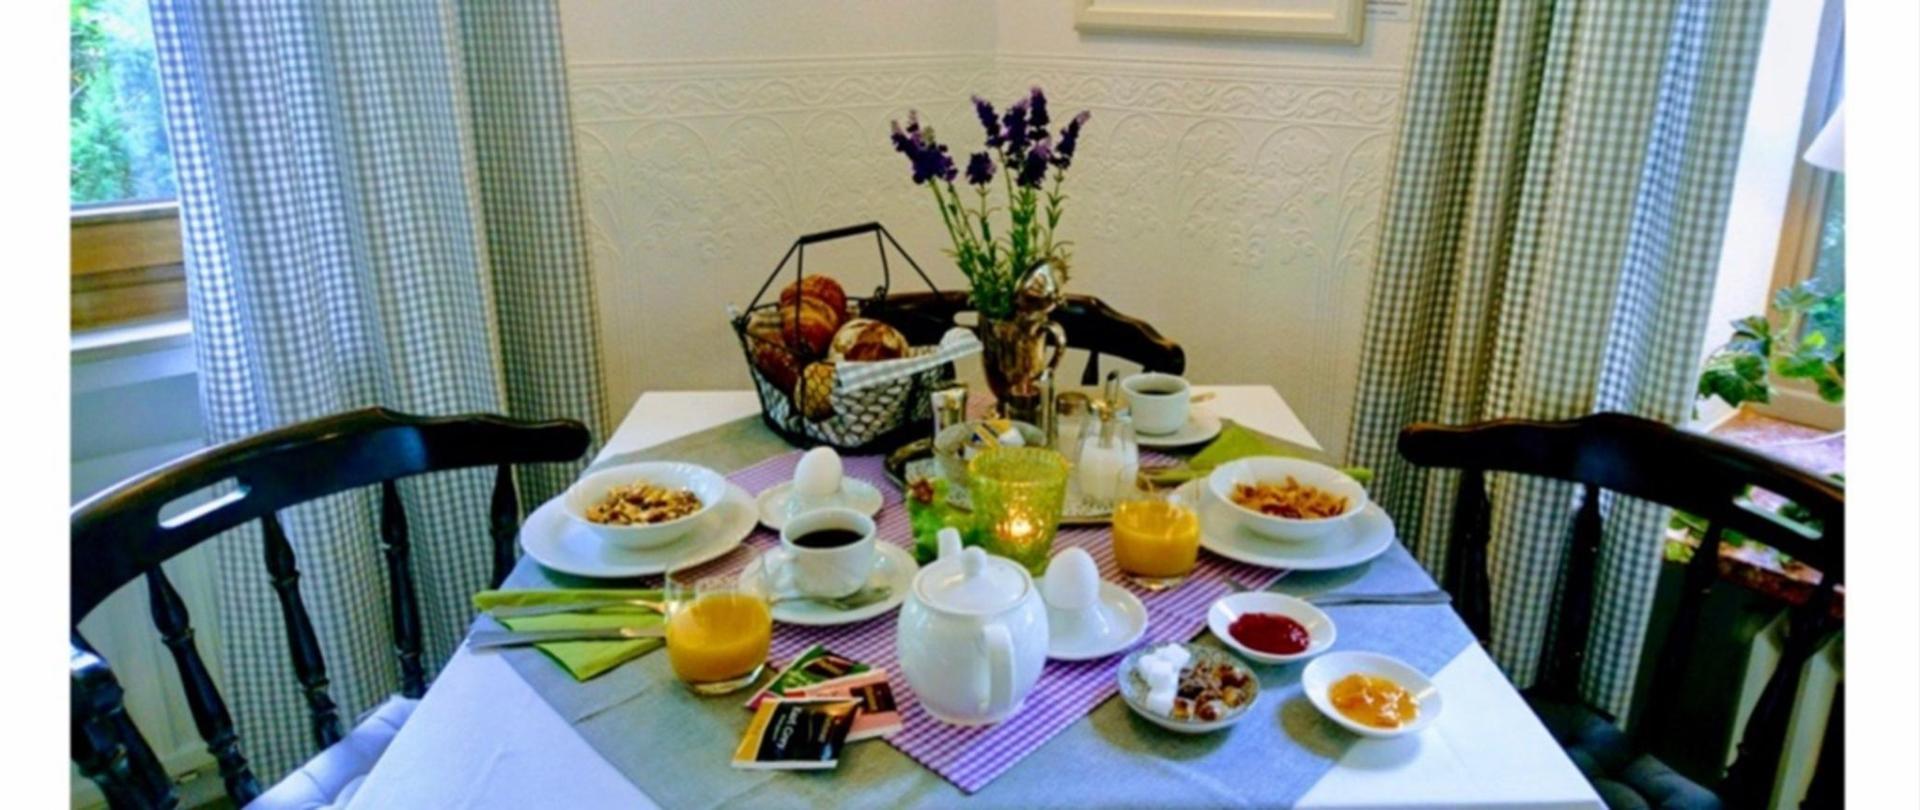 Frühstück4.jpg